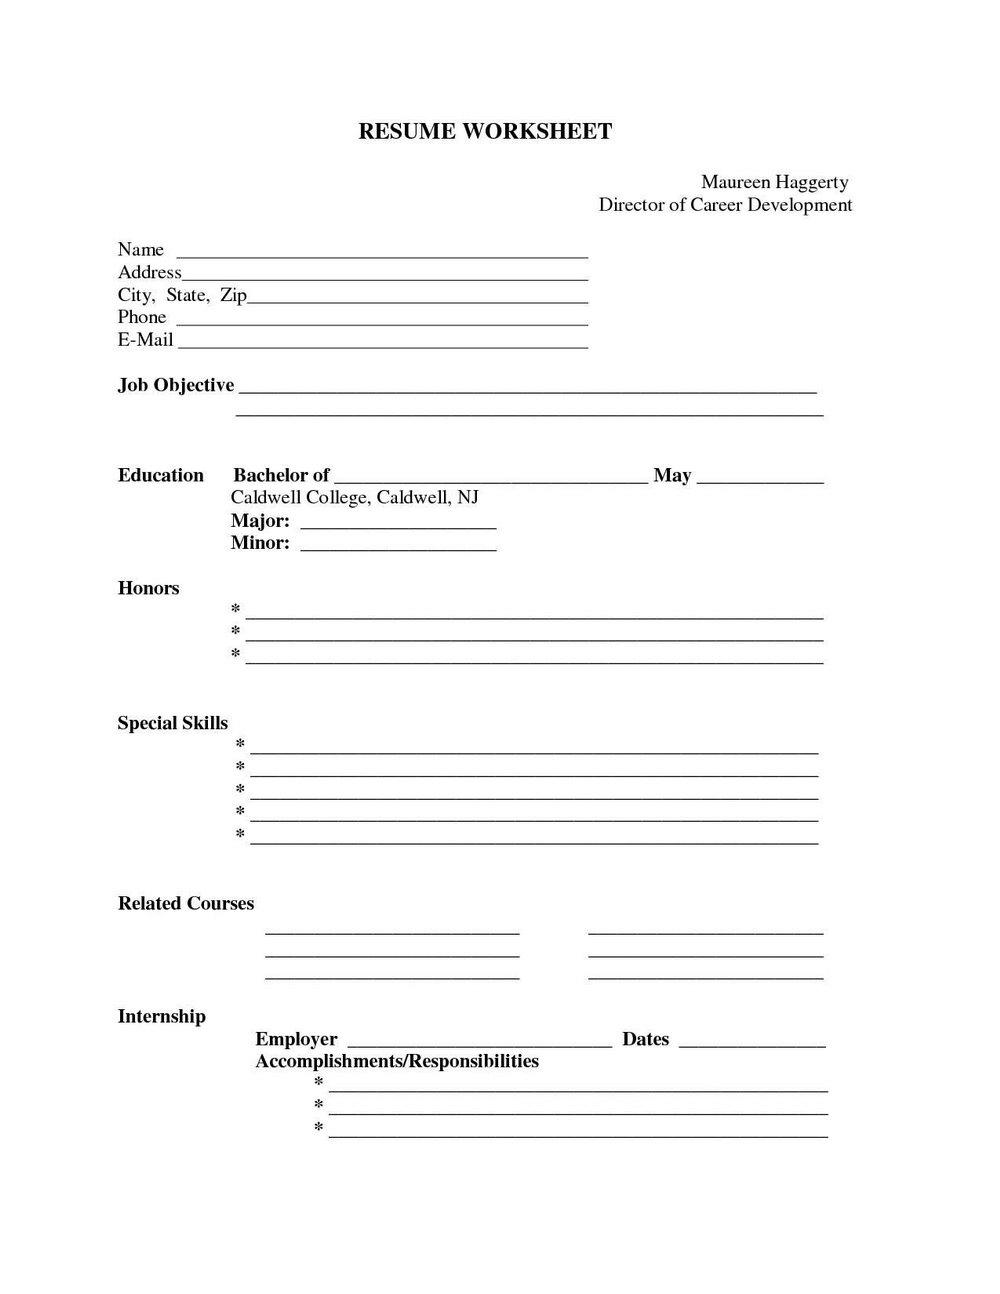 Free Resume Format To Print